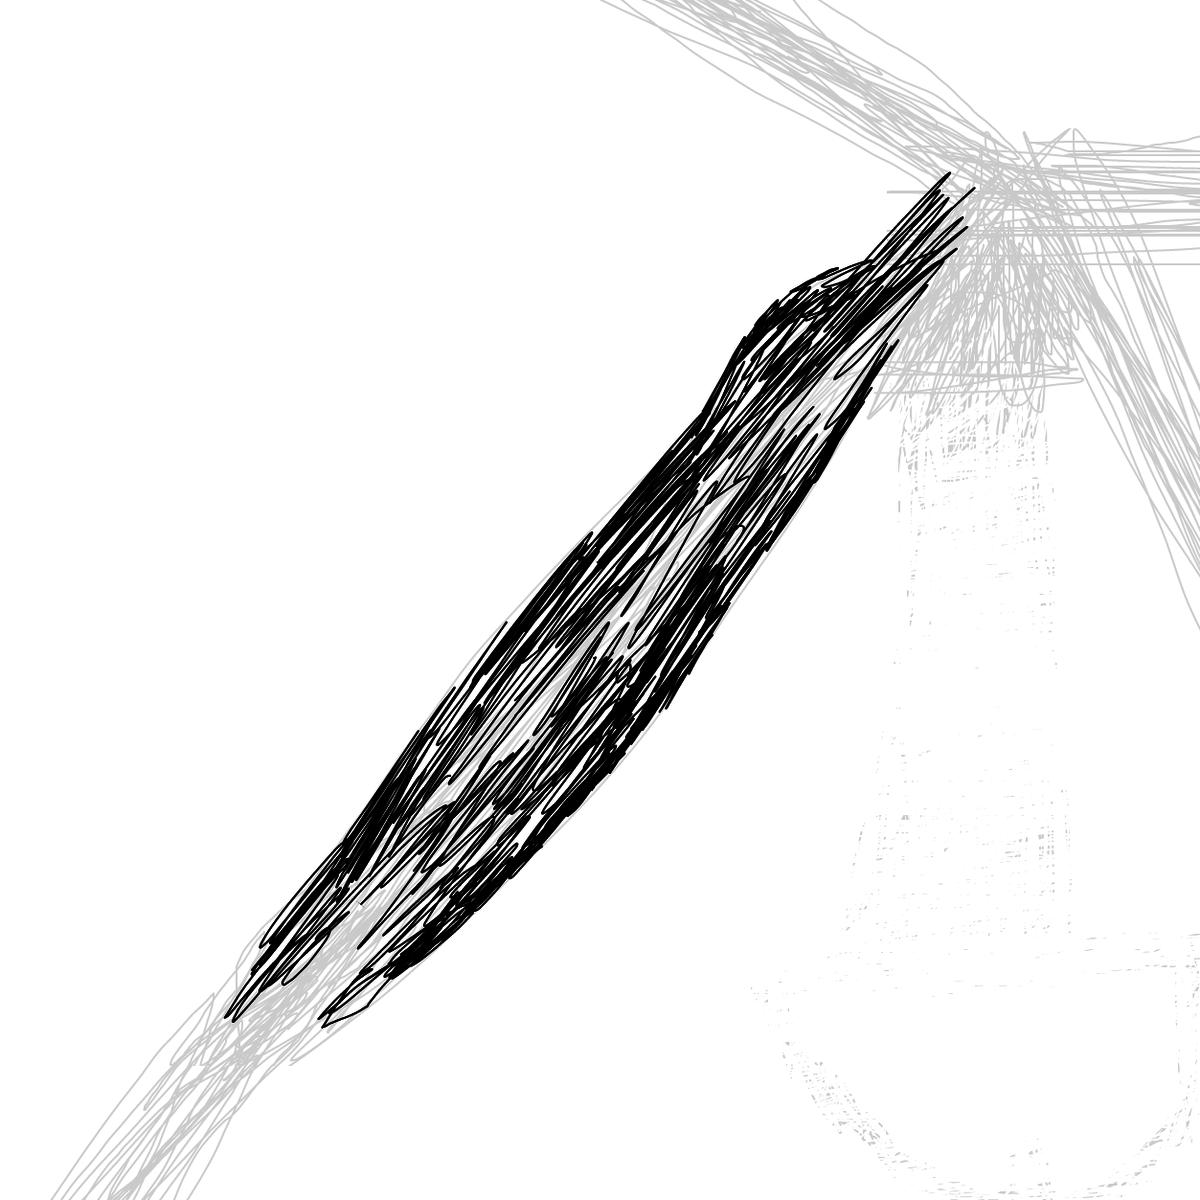 BAAAM drawing#11613 lat:52.4751167297363300lng: 13.4078845977783200